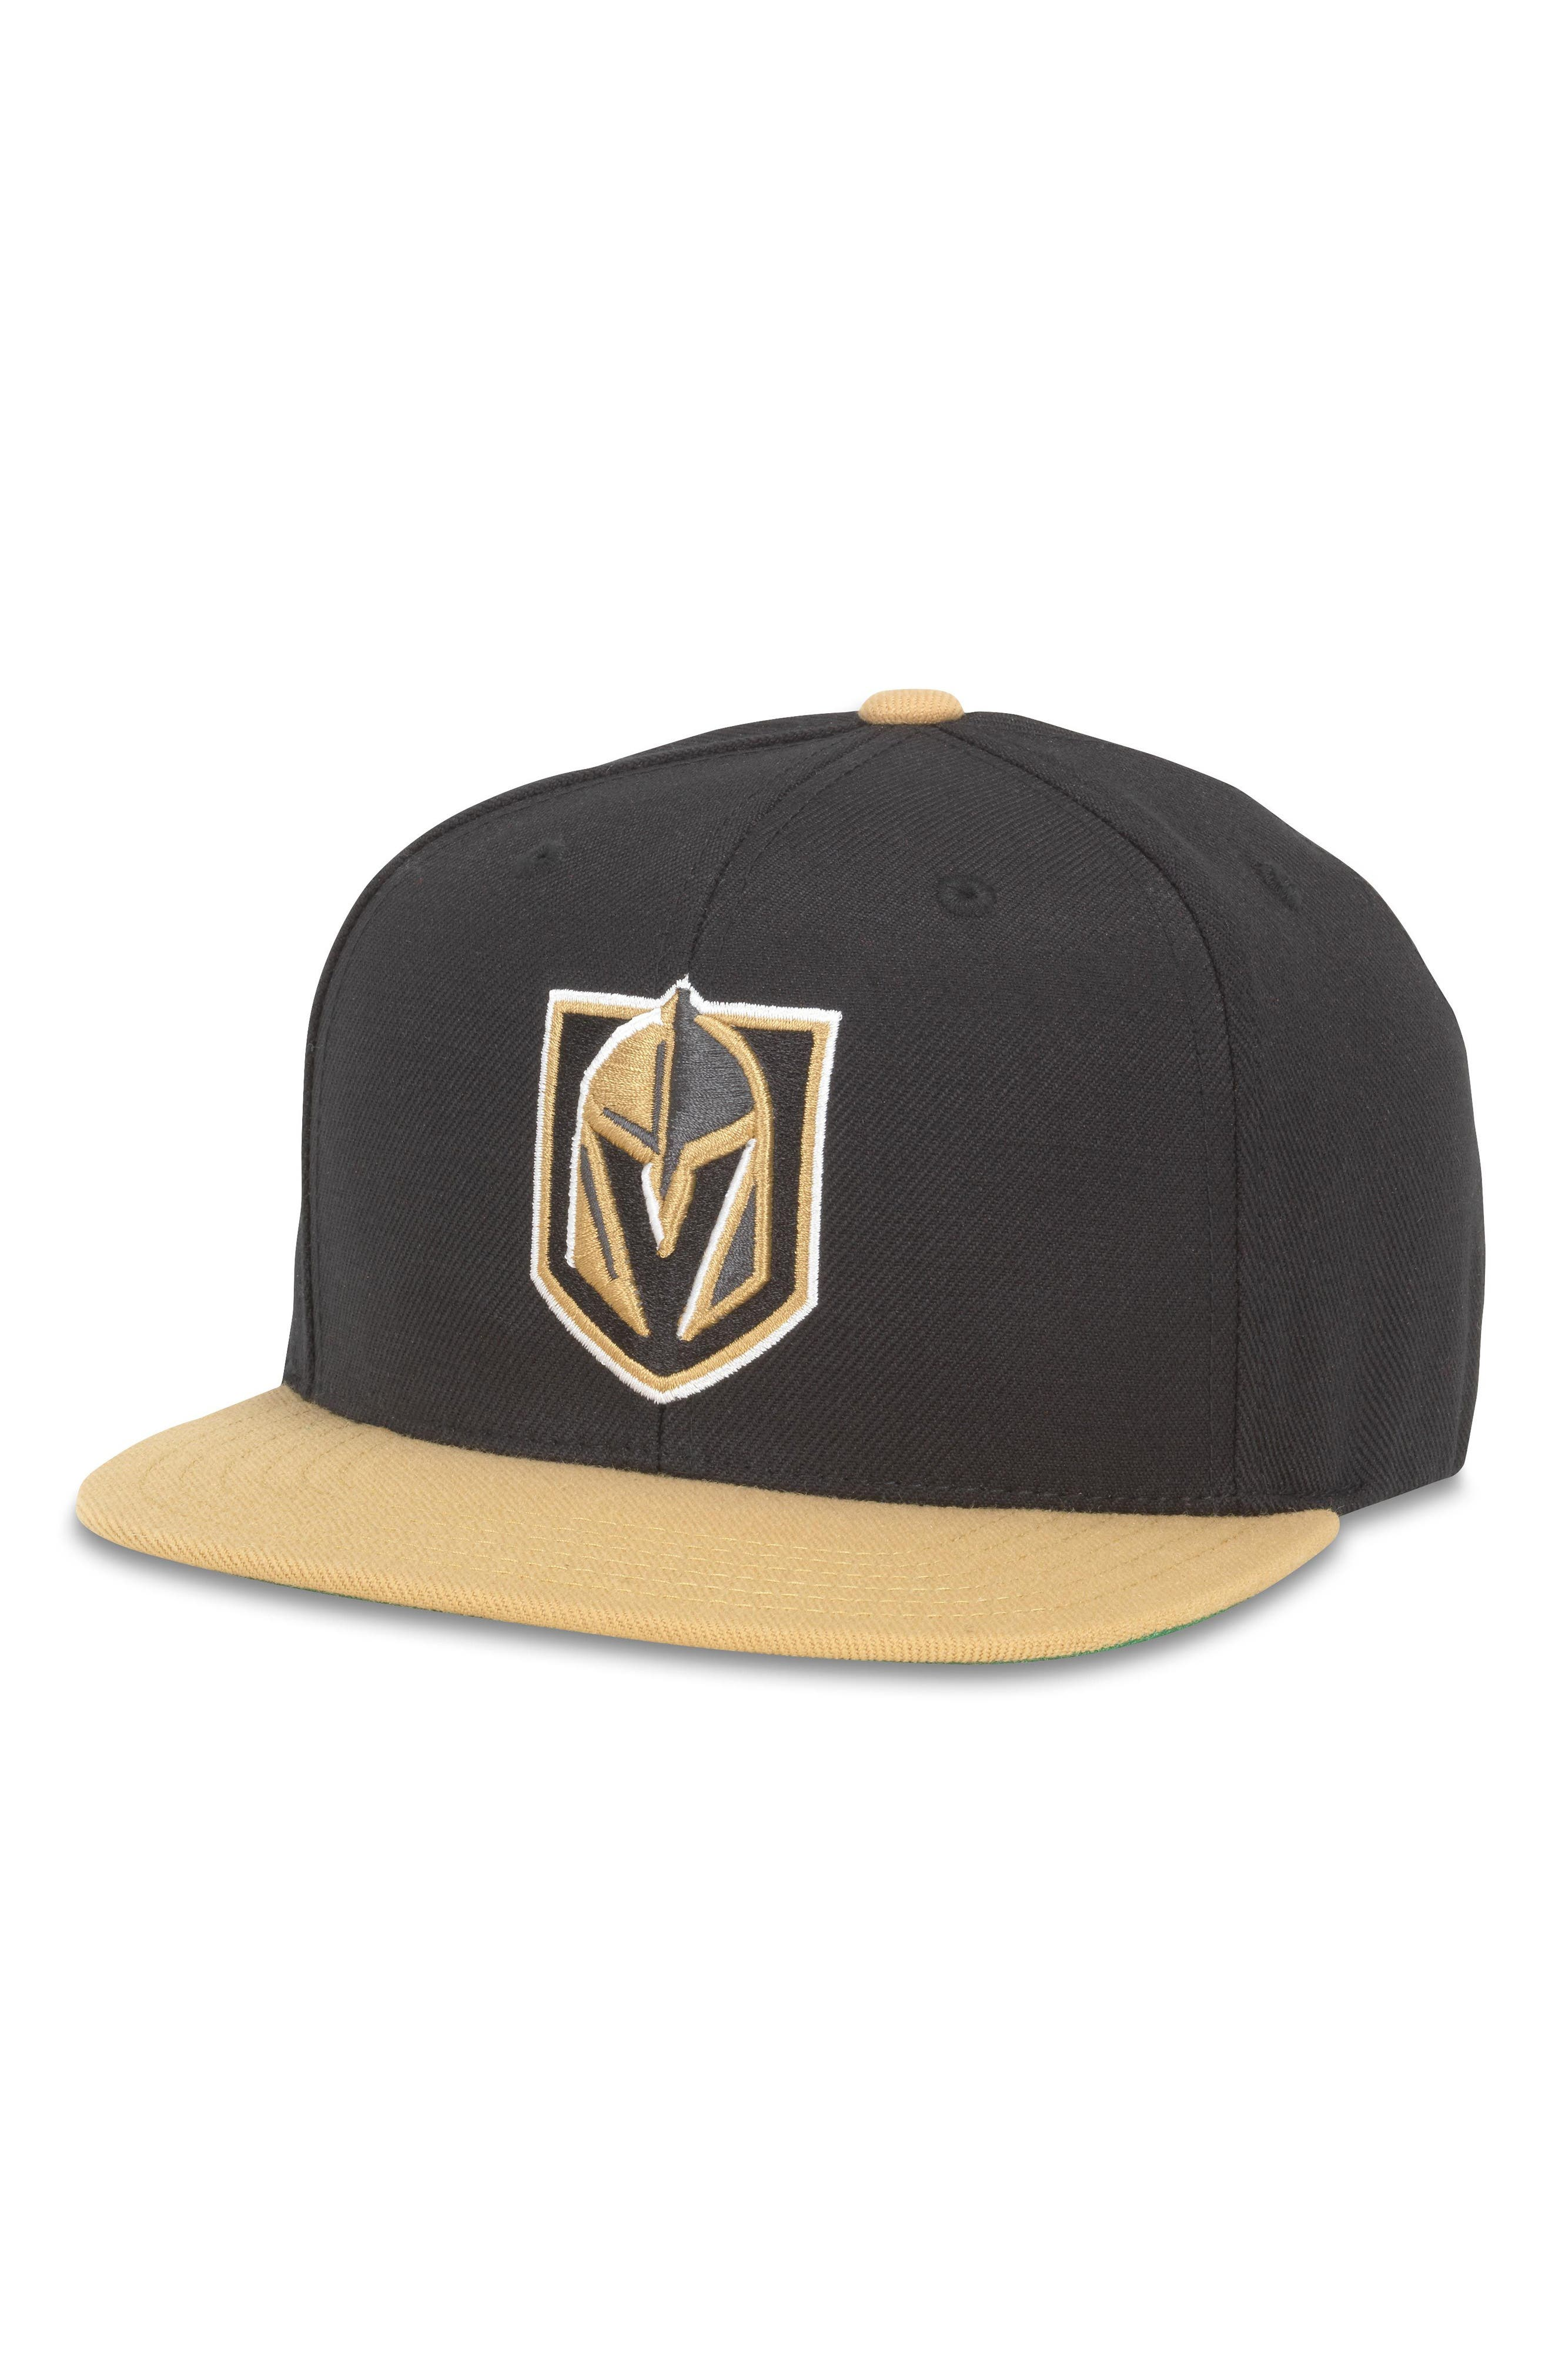 400 Series NHL Cap,                             Main thumbnail 1, color,                             VEGAS KNIGHTS/ BLACK/ GOLD